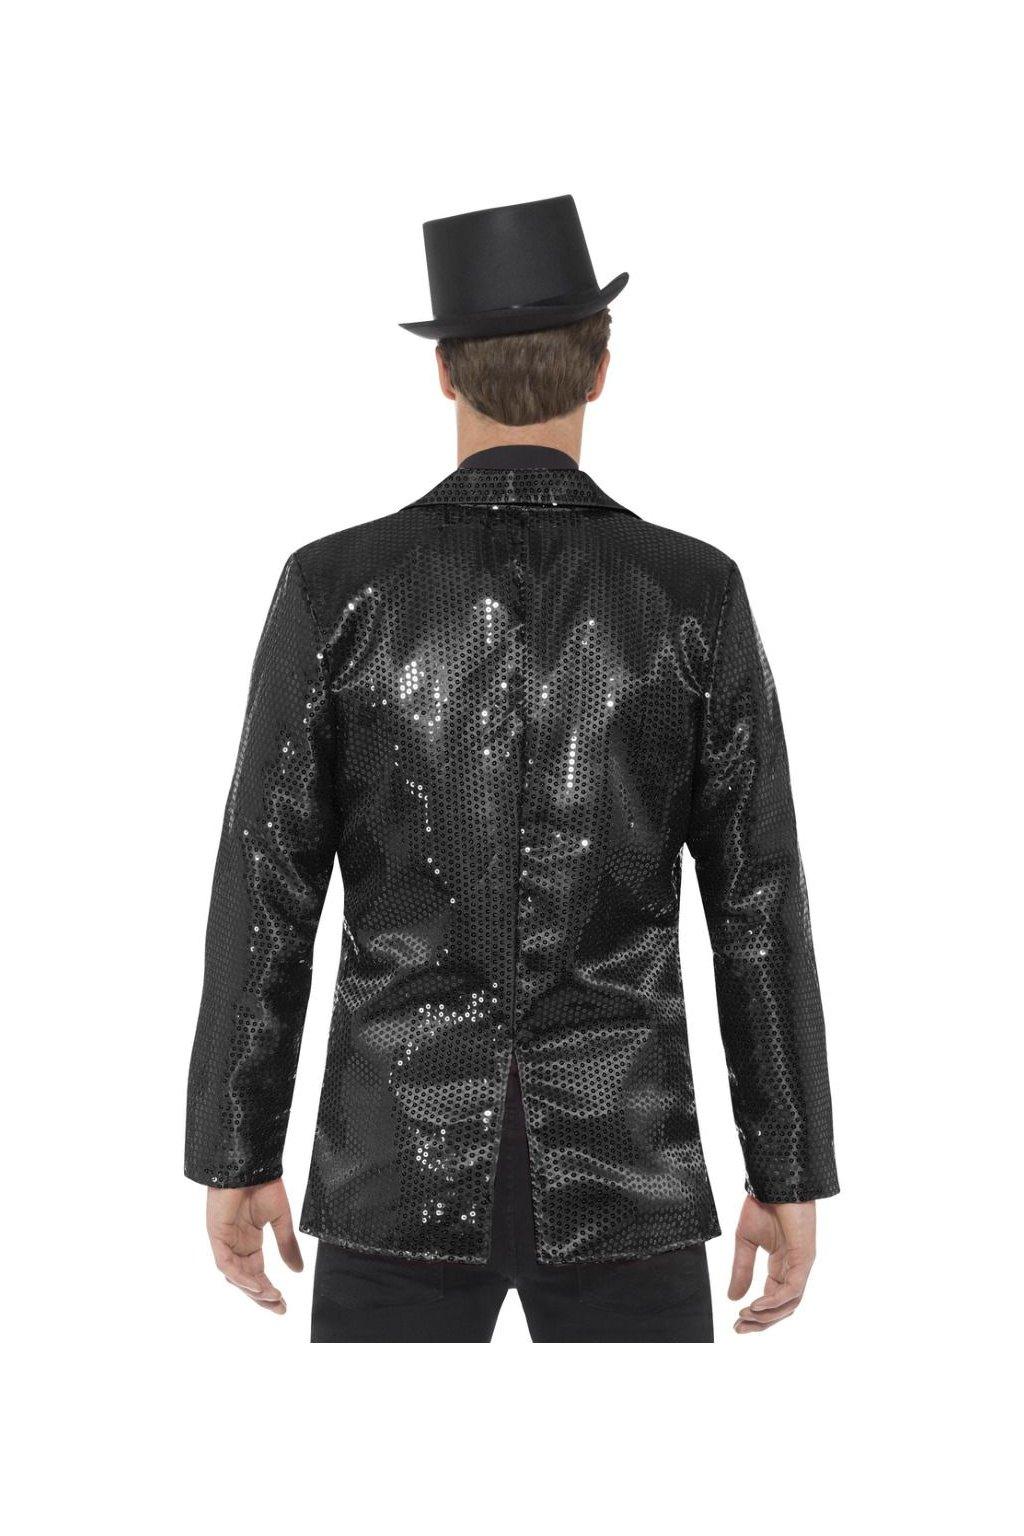 Flitrované pánské sako - černé